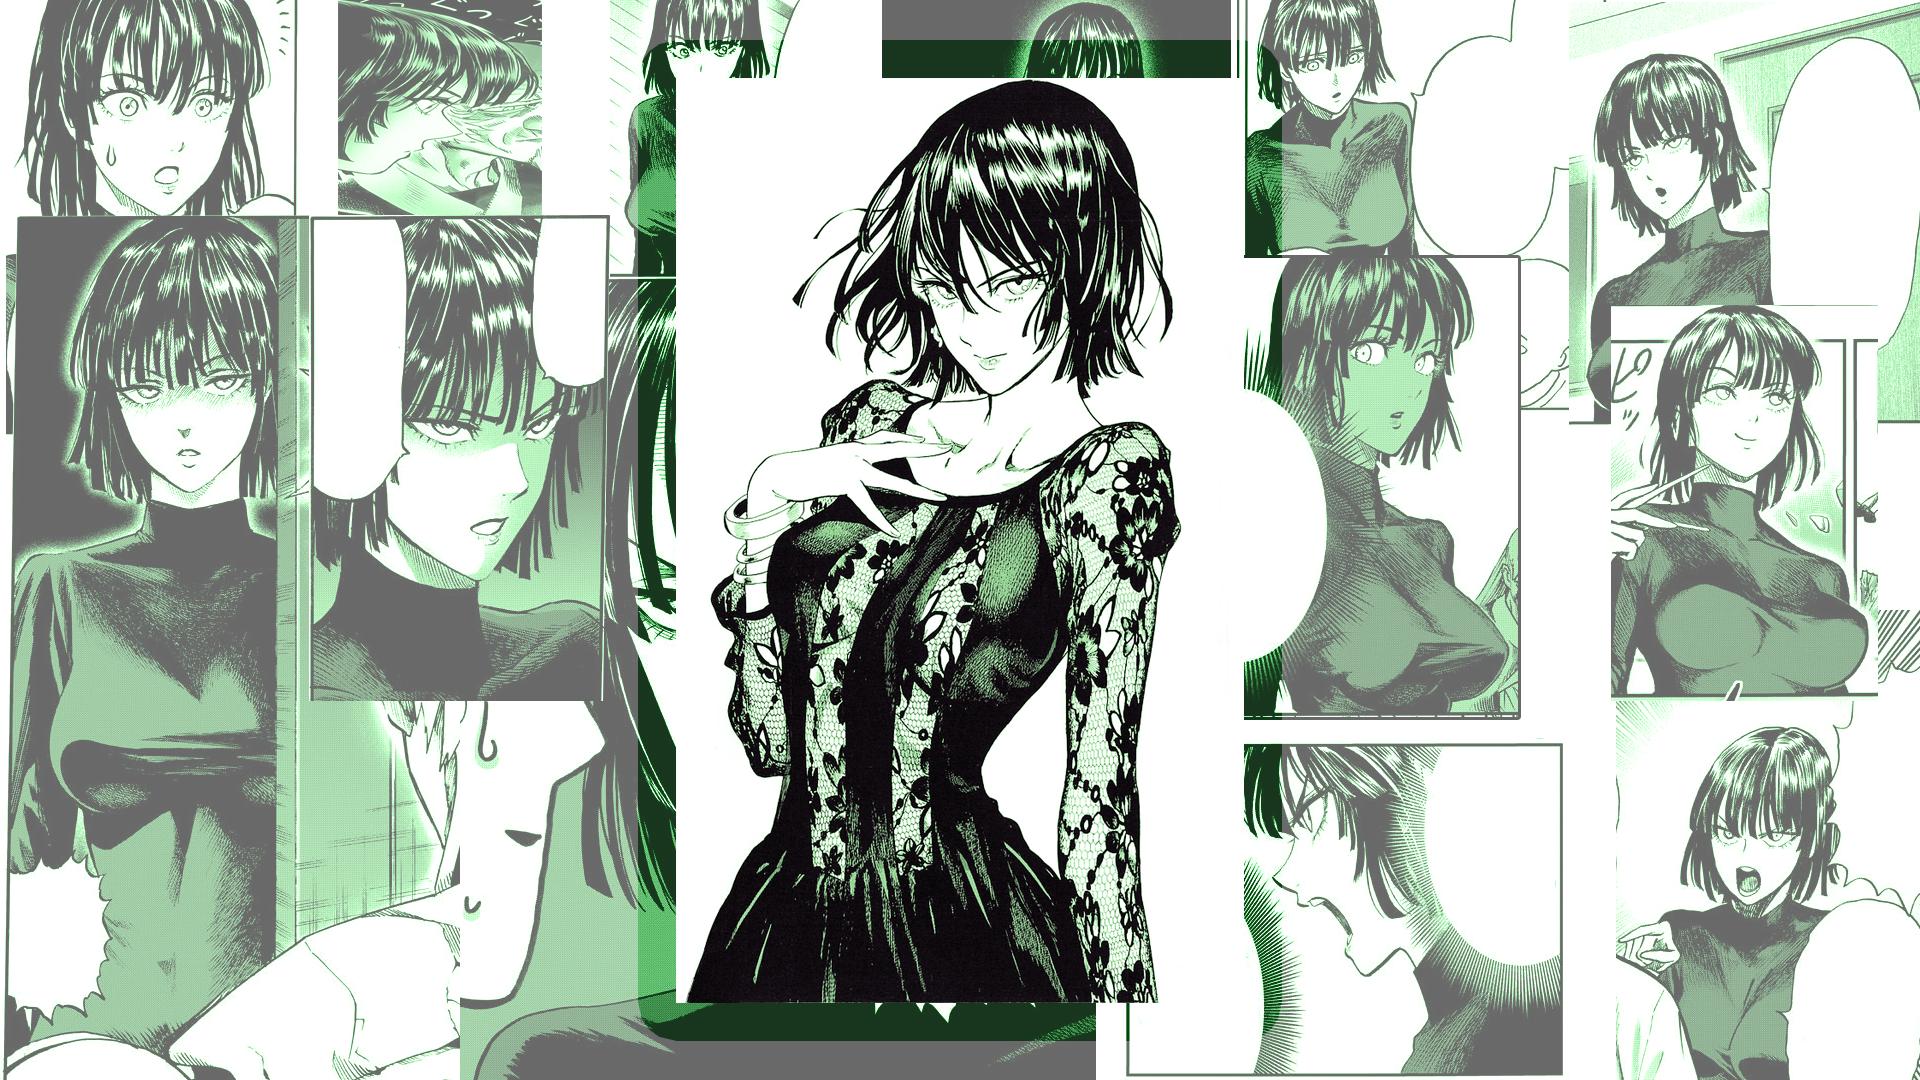 Wallpaper One Punch Man Fubuki Anime Manga 1920x1080